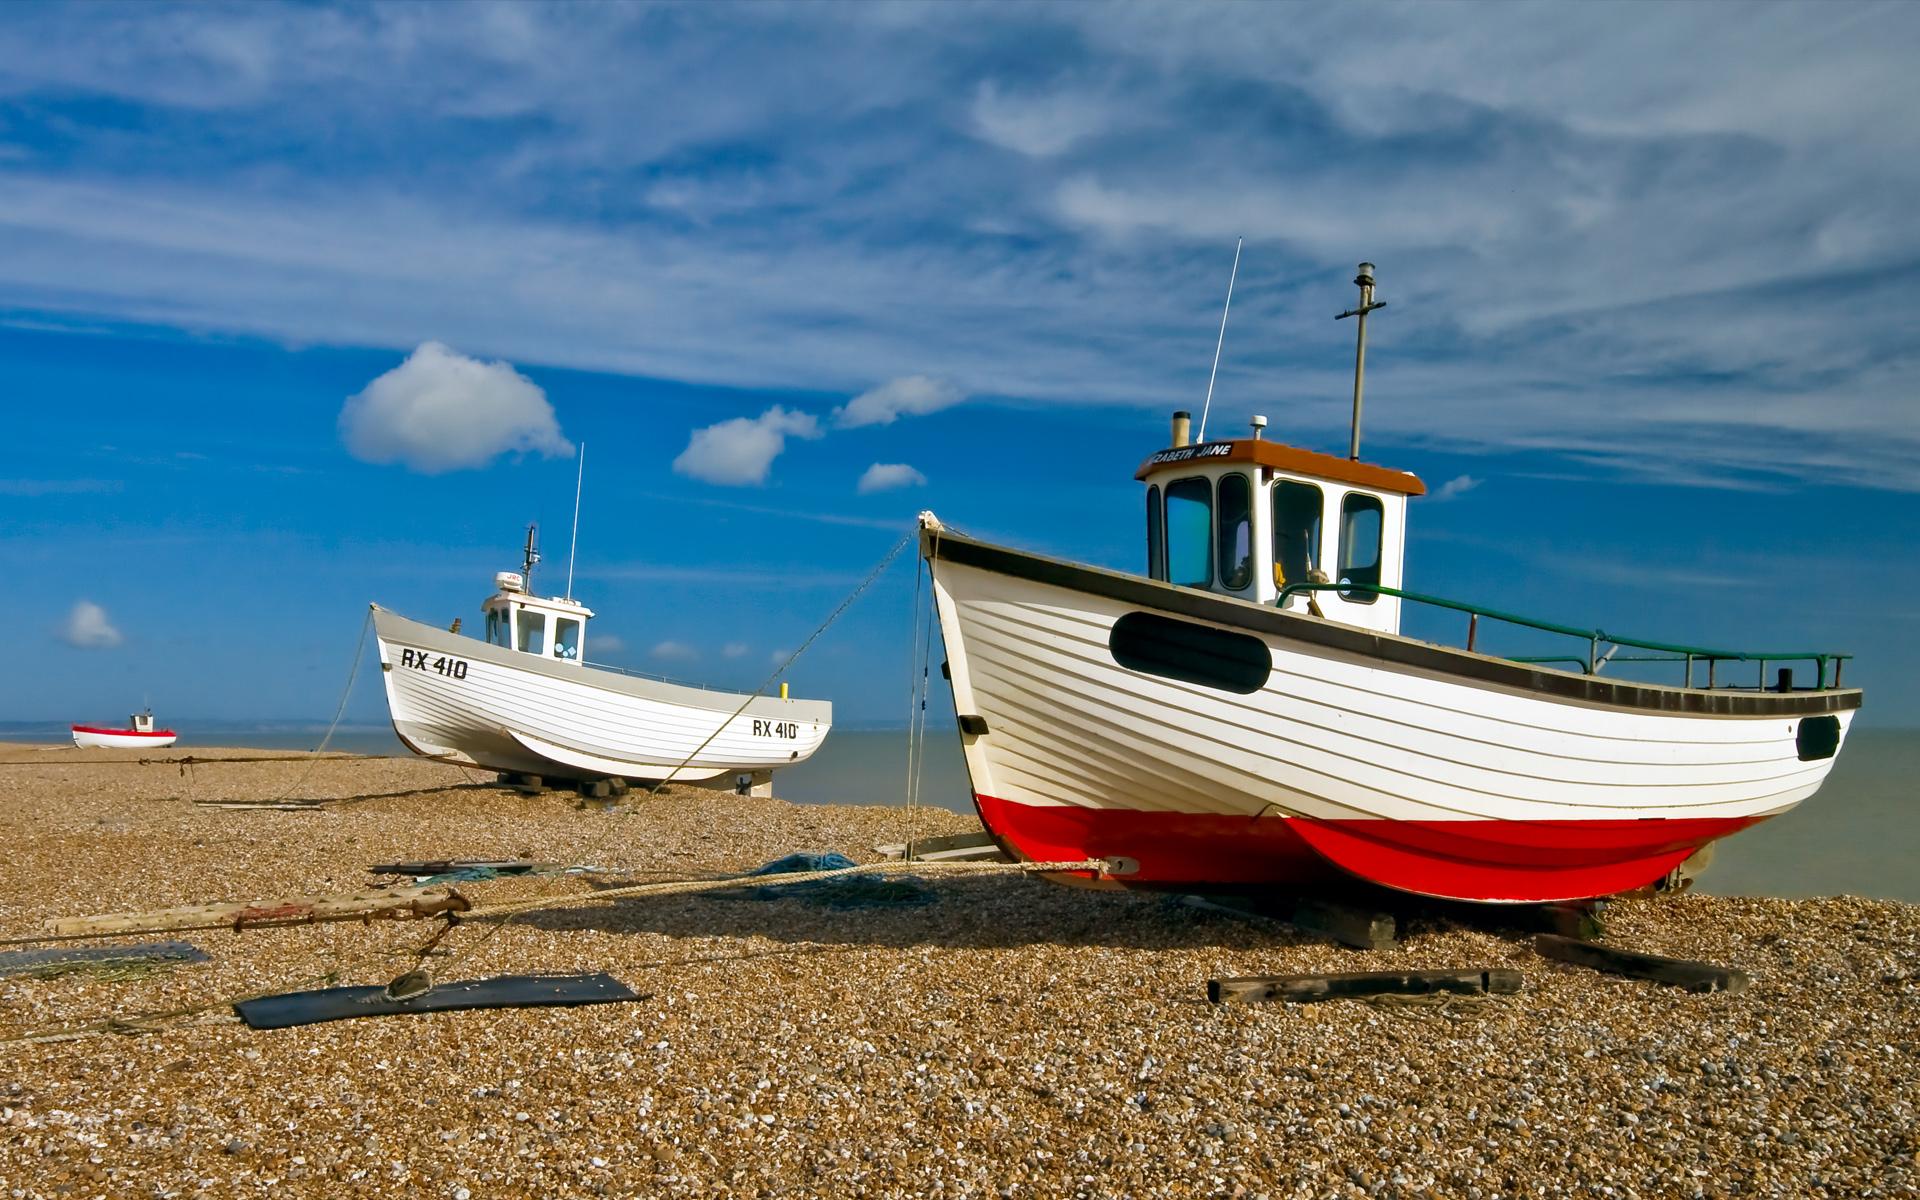 пляж, катера, лодки, море, обои на рабочий стол